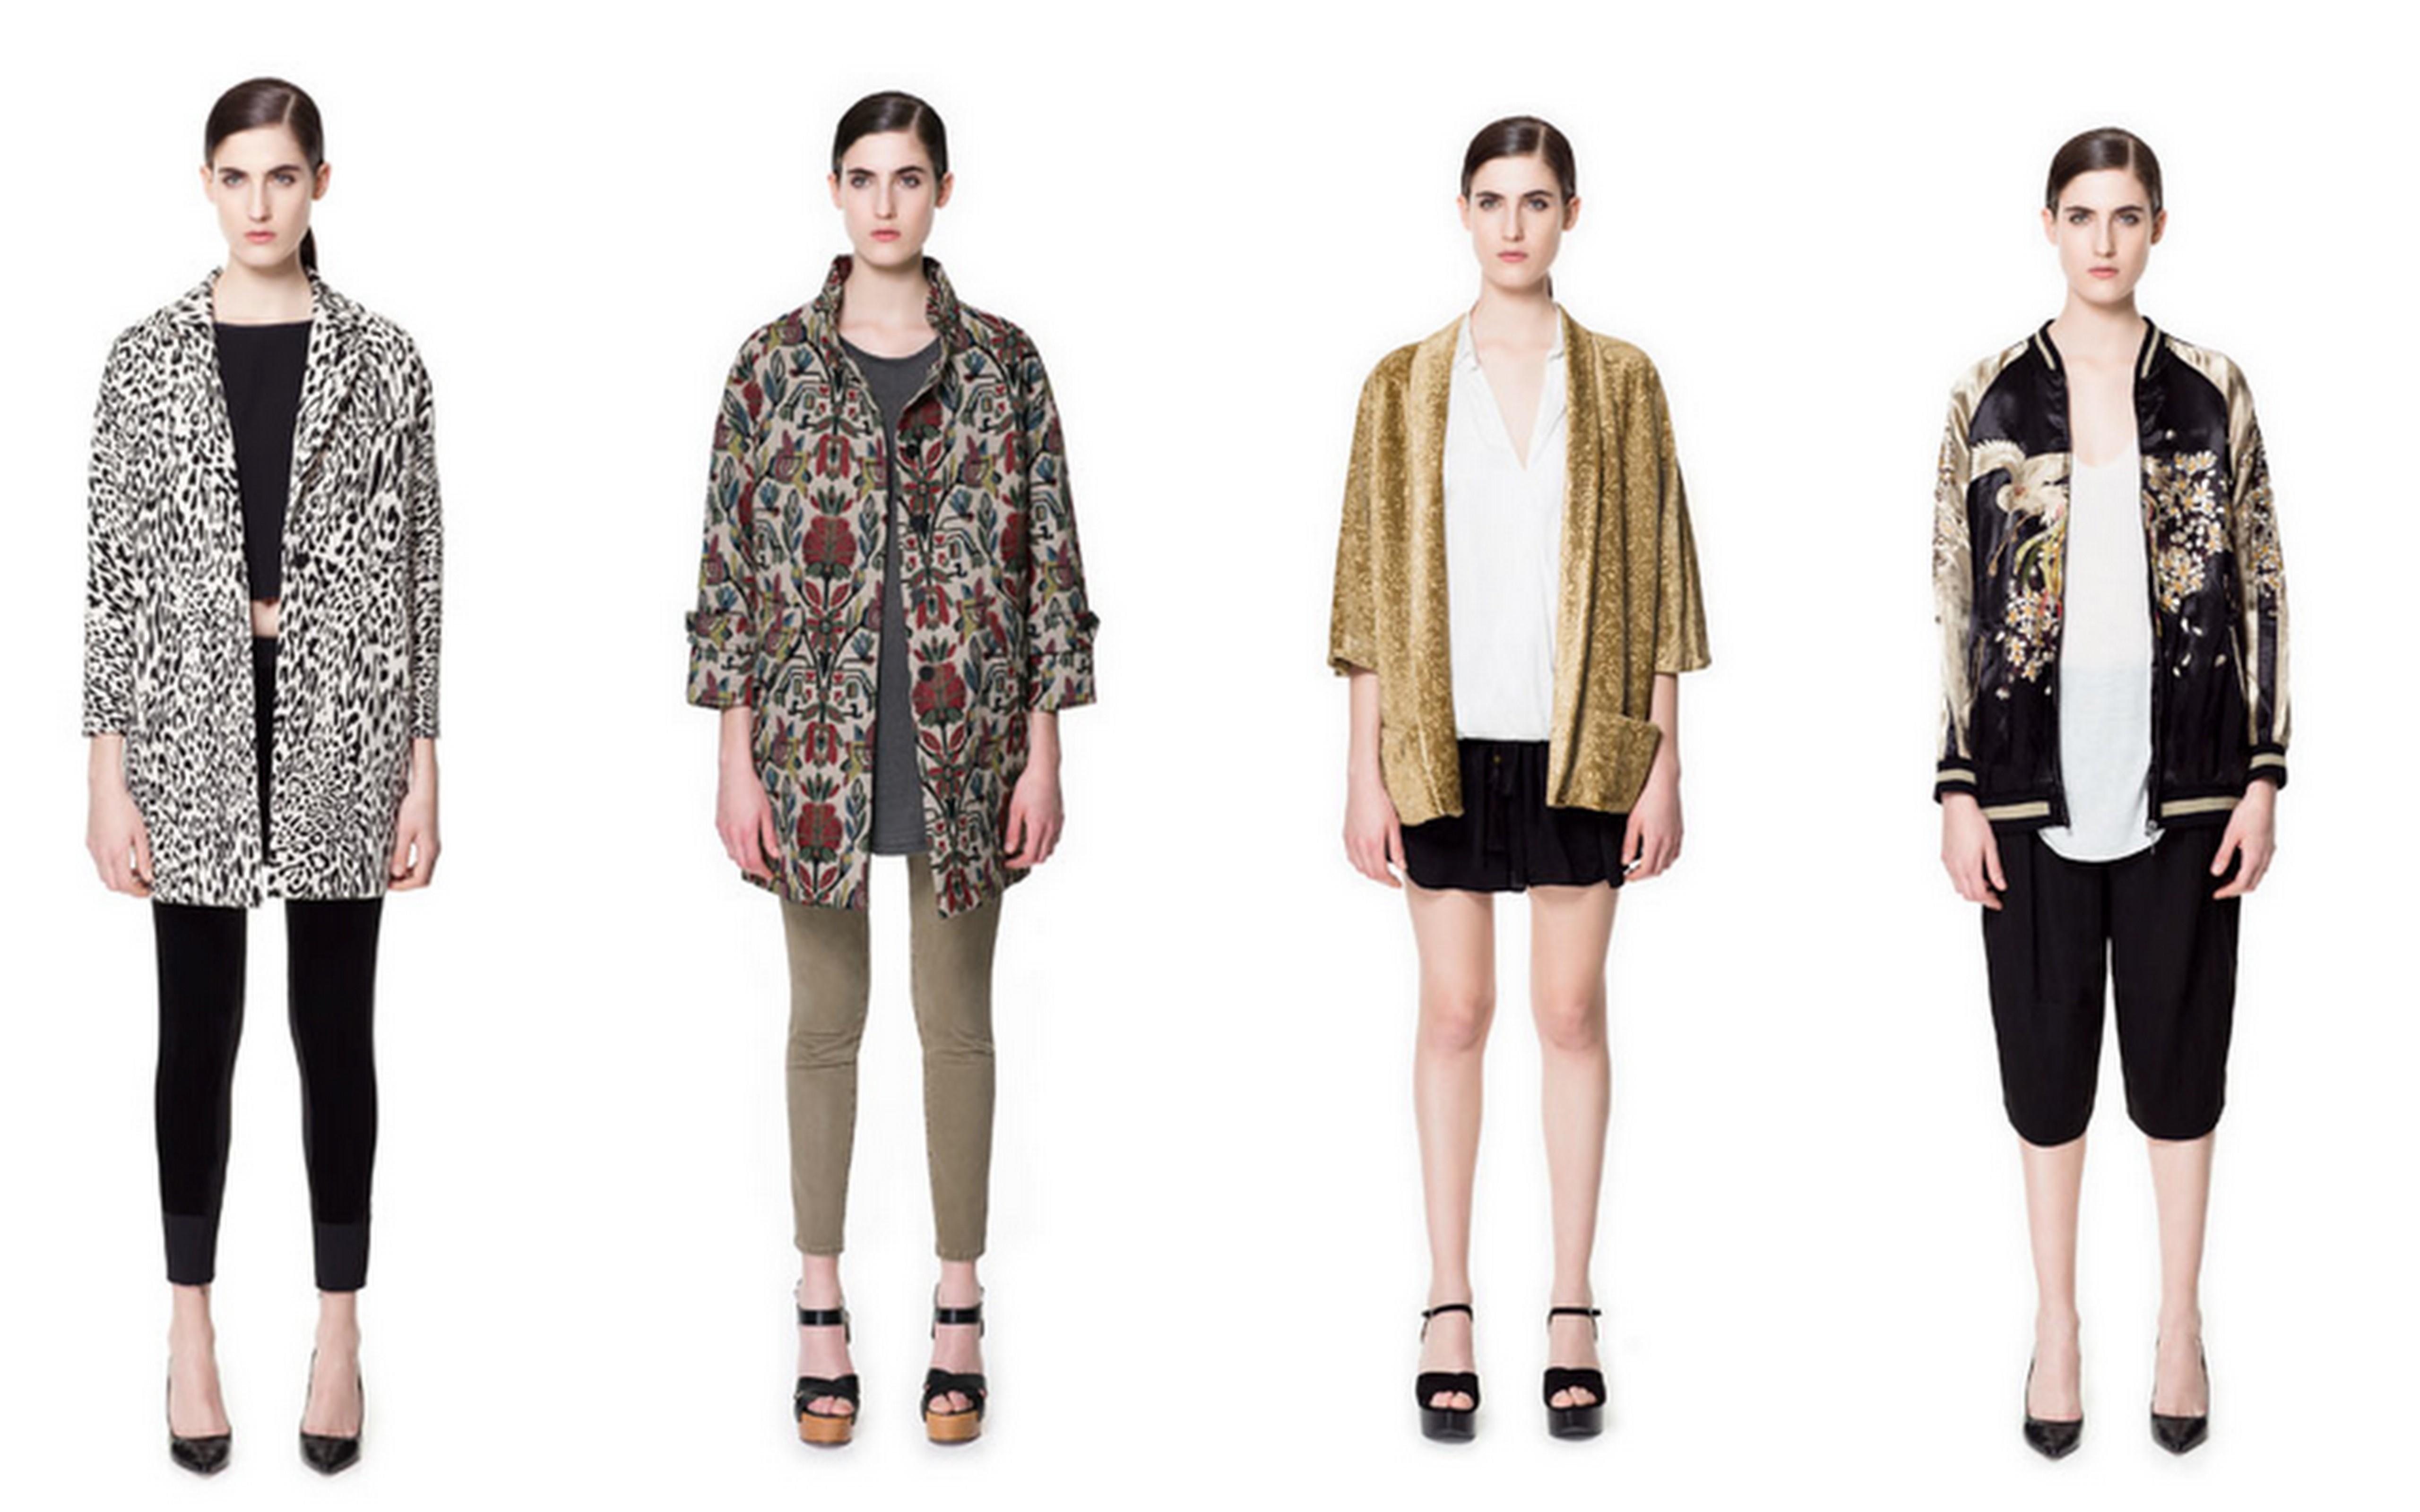 55e6284a white cheetah print coat, floral jacquard carpet bag coat, velvet kimono  coat, embroidered bomber all at Zara.